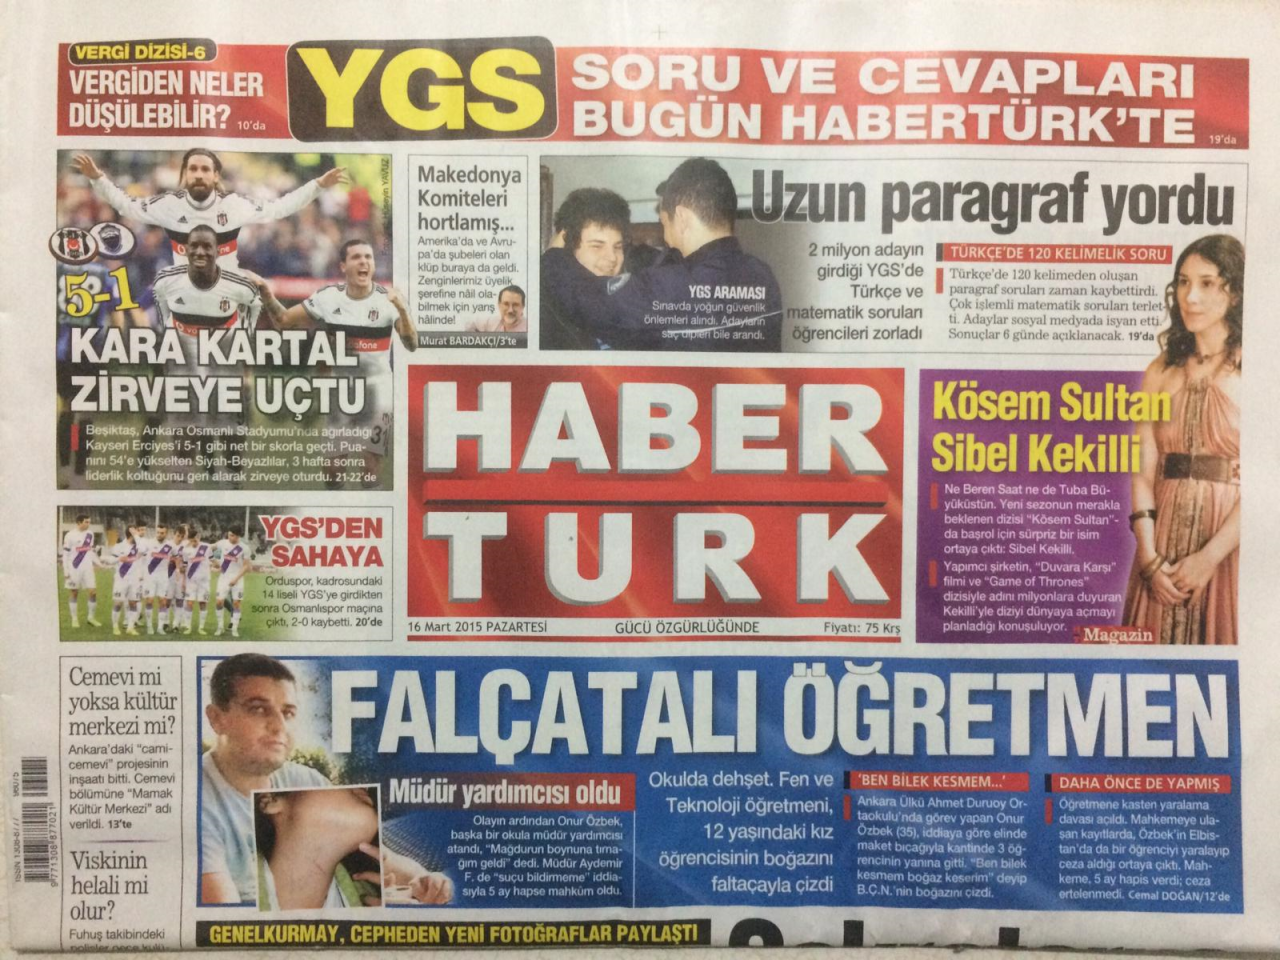 Kekilli türk sibel Seks Flimleri